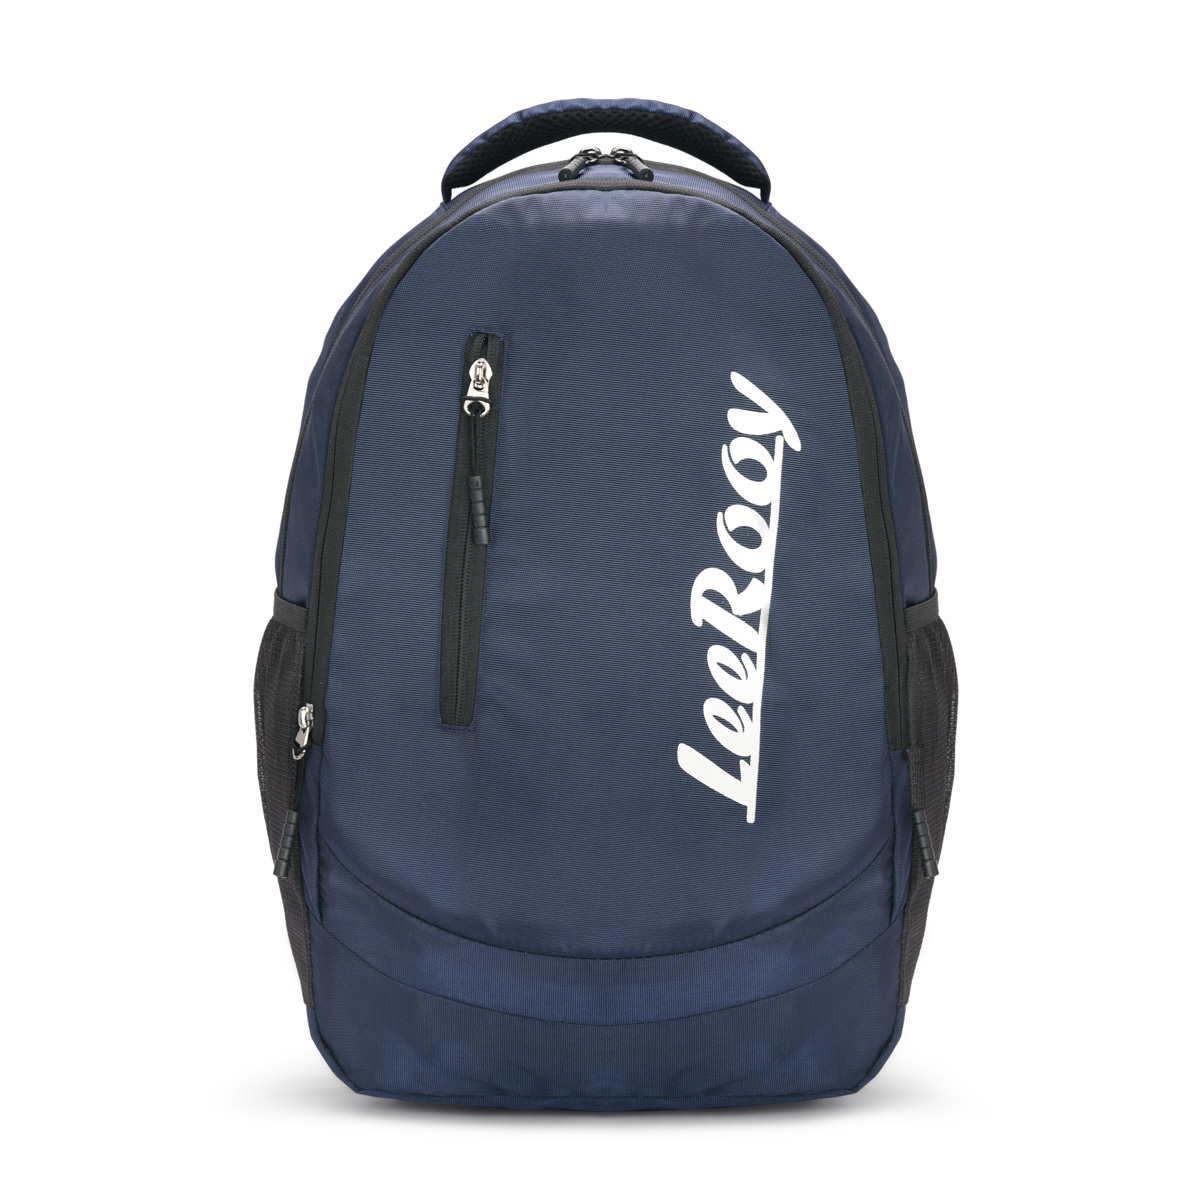 LeeRooy BAG 15 BLUE NHU Backpack  Blue, 16 L